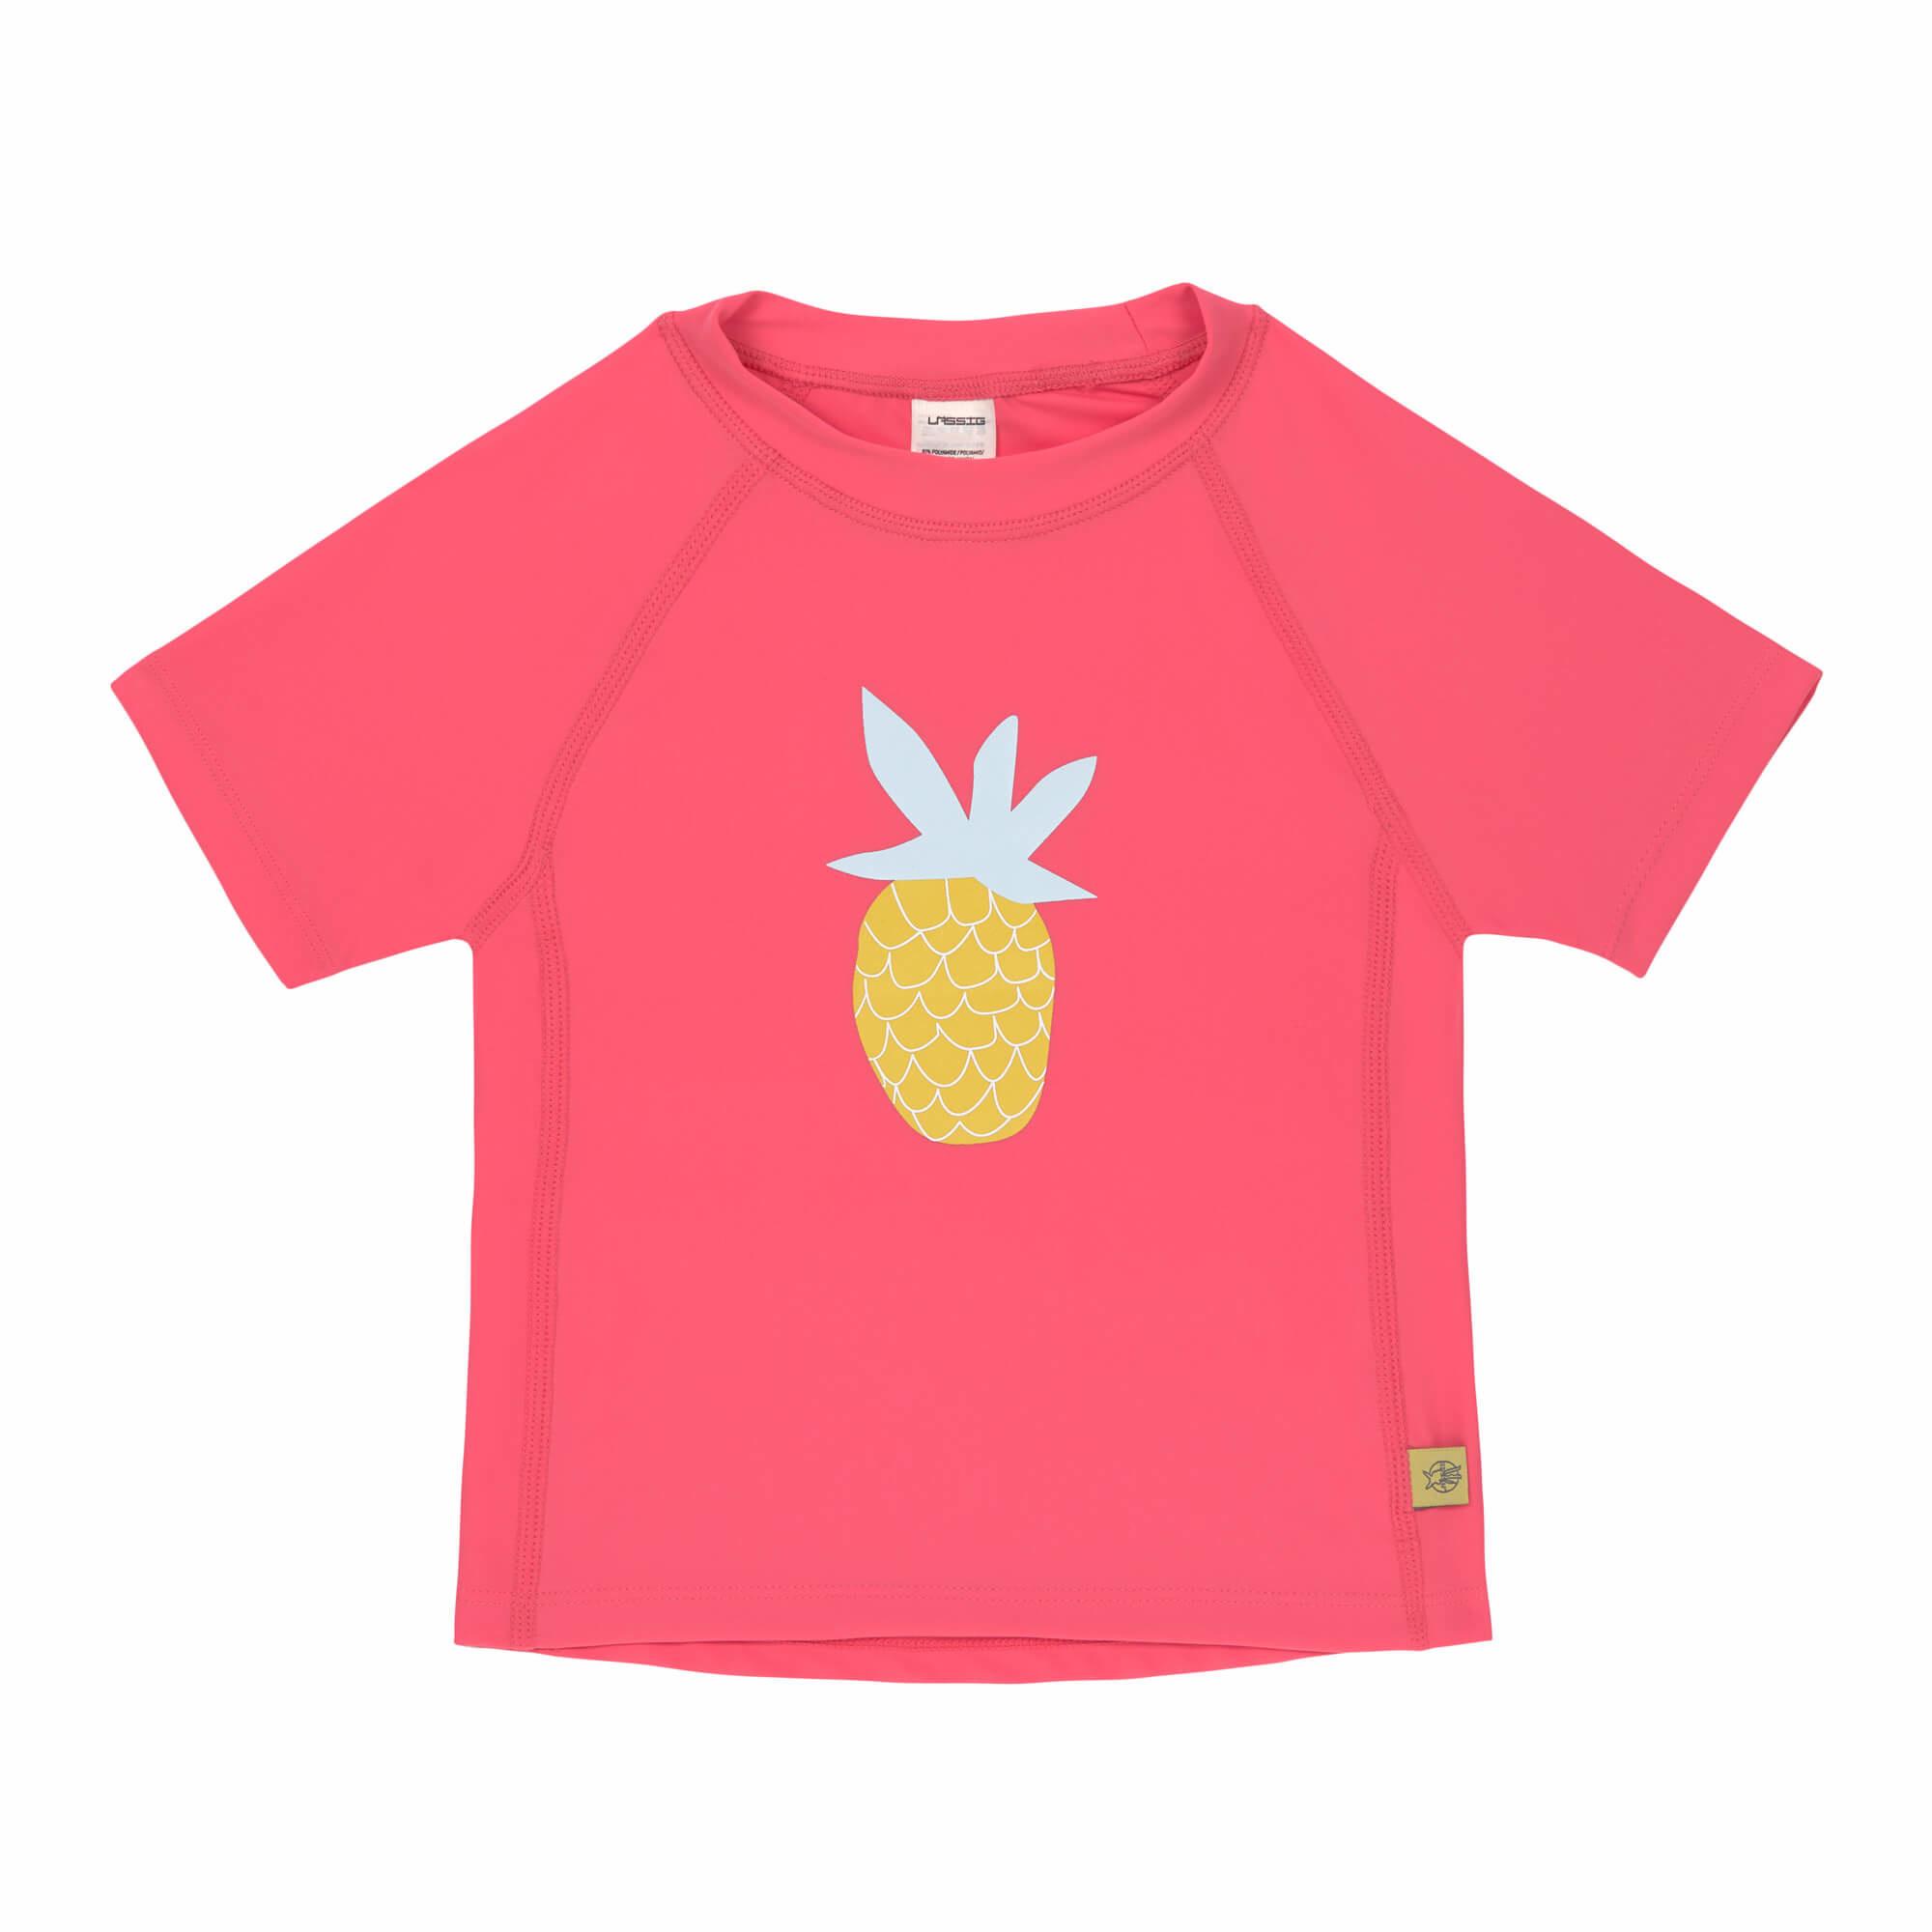 Lässig Splash & Fun Korte mouw Rashguard / zwemshirt - pineapple